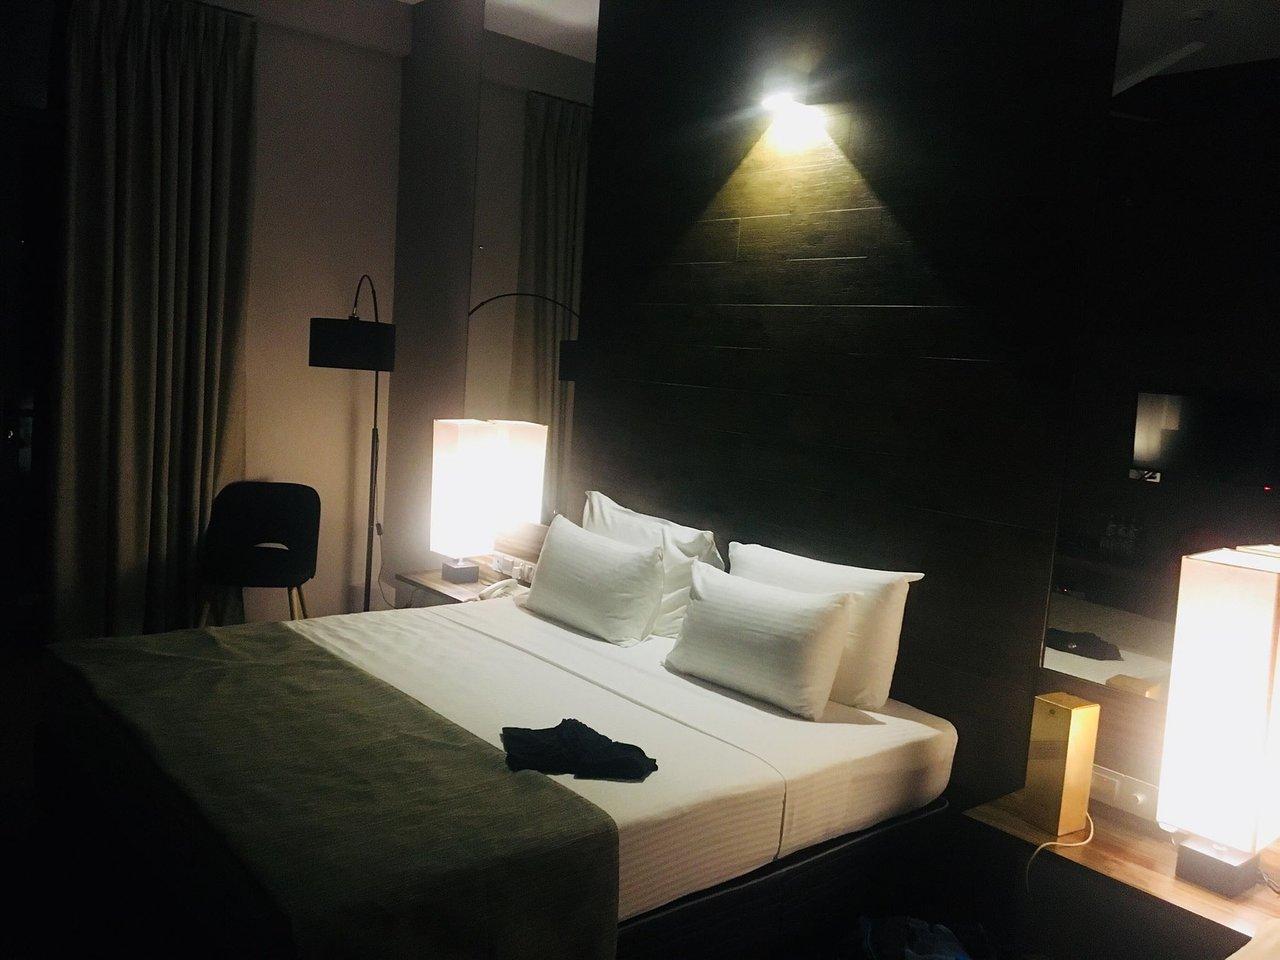 Kai Hikkaduwa 74 90 Updated 2018 Prices Specialty Bb Sabun Hotel Beauty Reviews Sri Lanka Tripadvisor